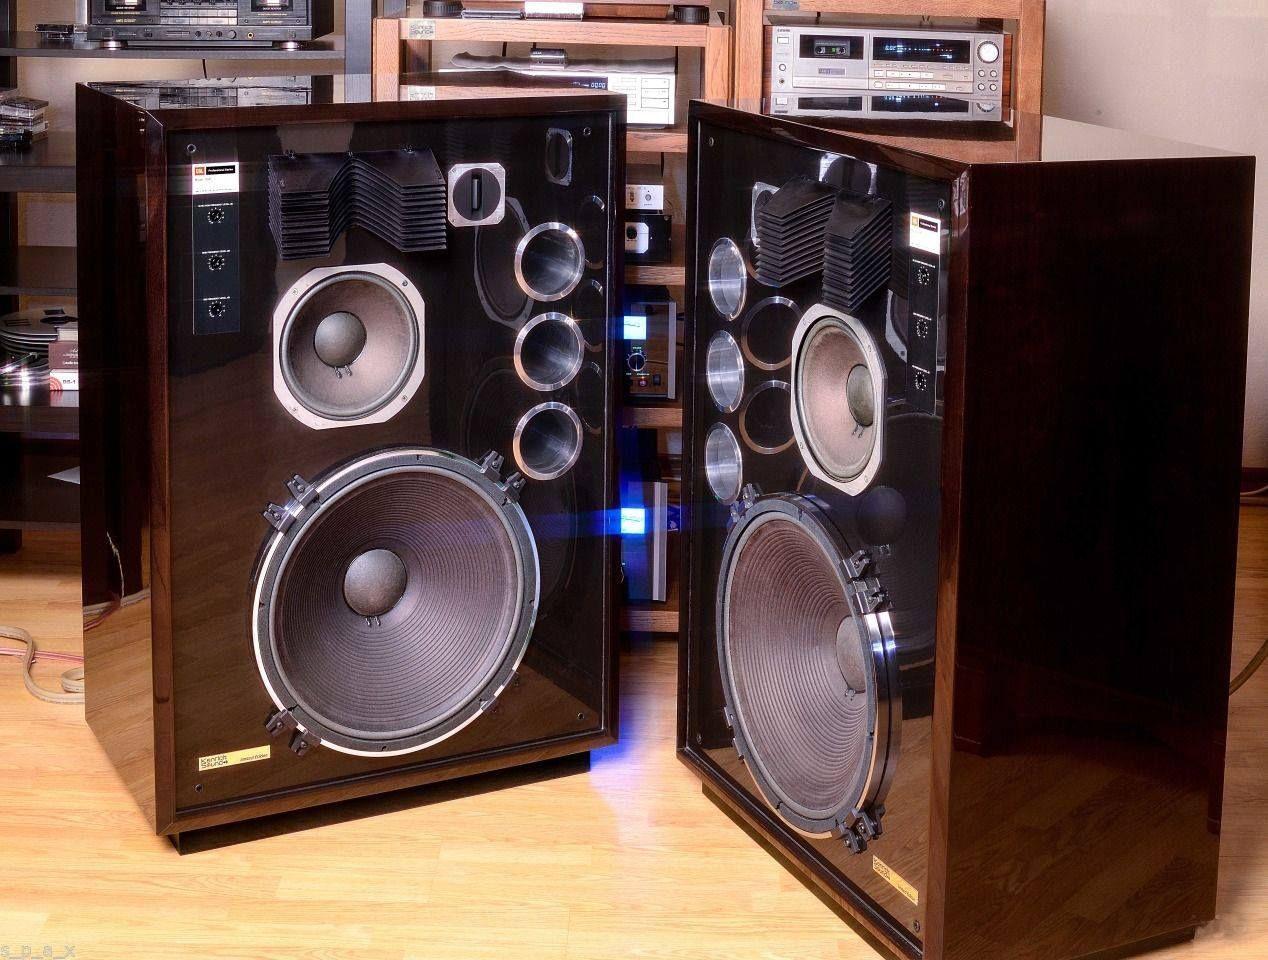 jbl 4345 limited edition studio monitor speakers. Black Bedroom Furniture Sets. Home Design Ideas